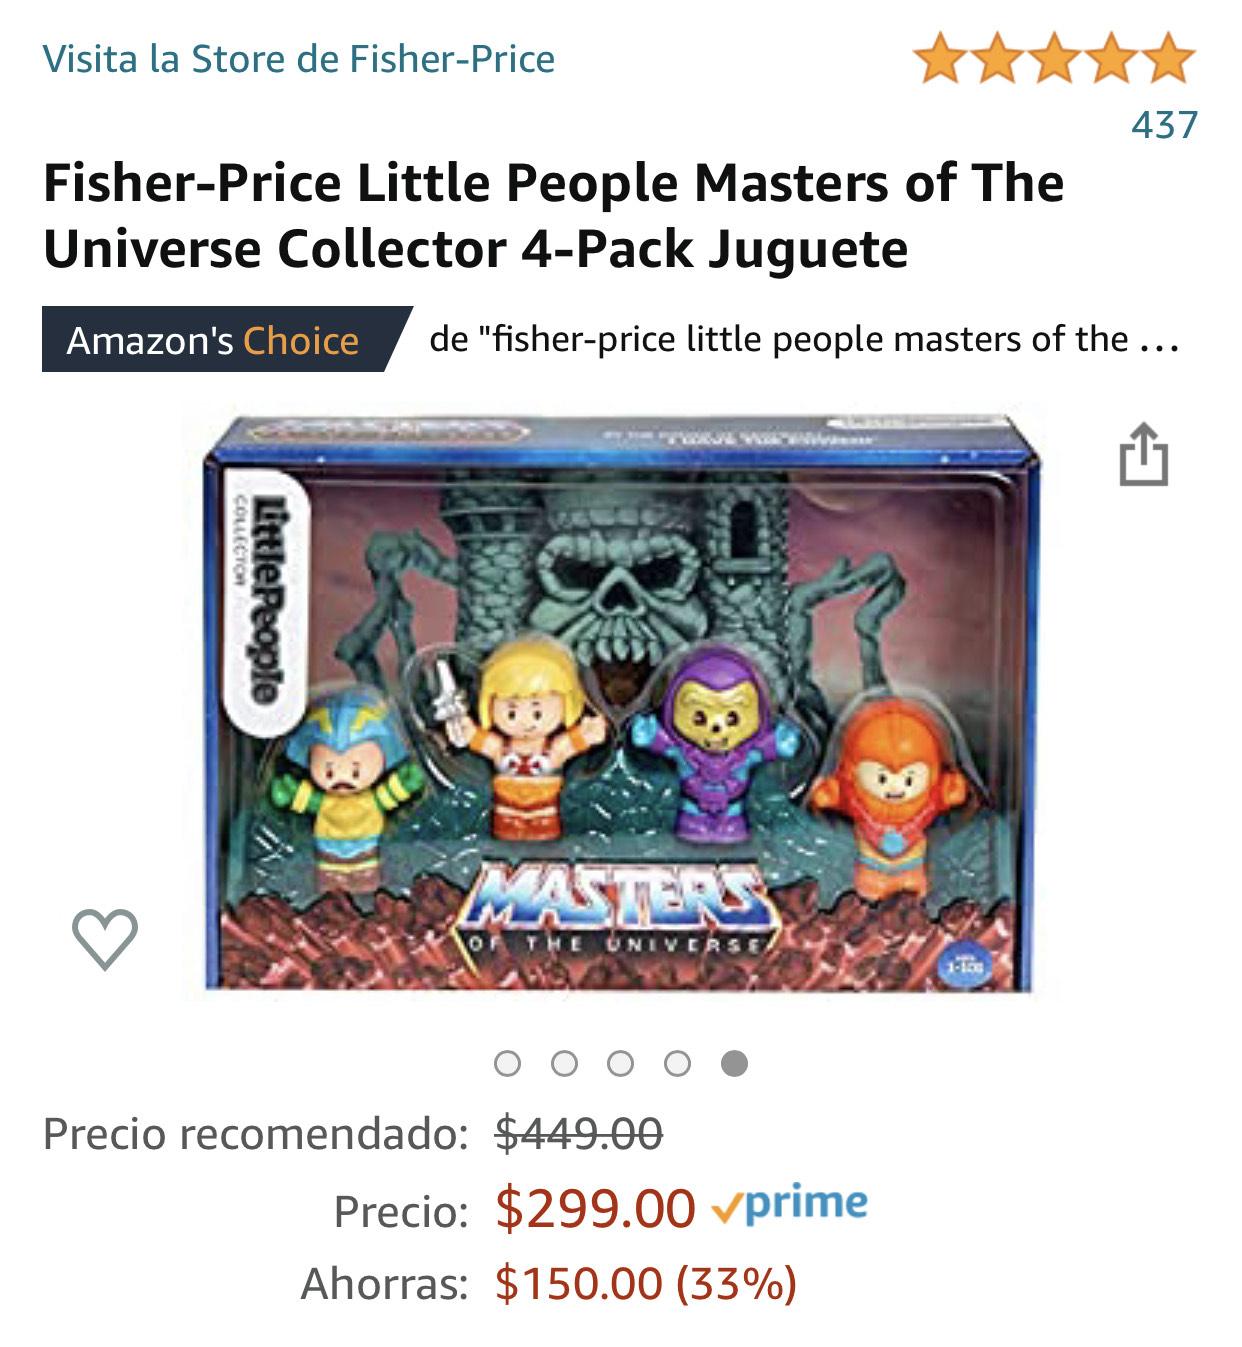 Amazonmx: Little People Masters of The Universe